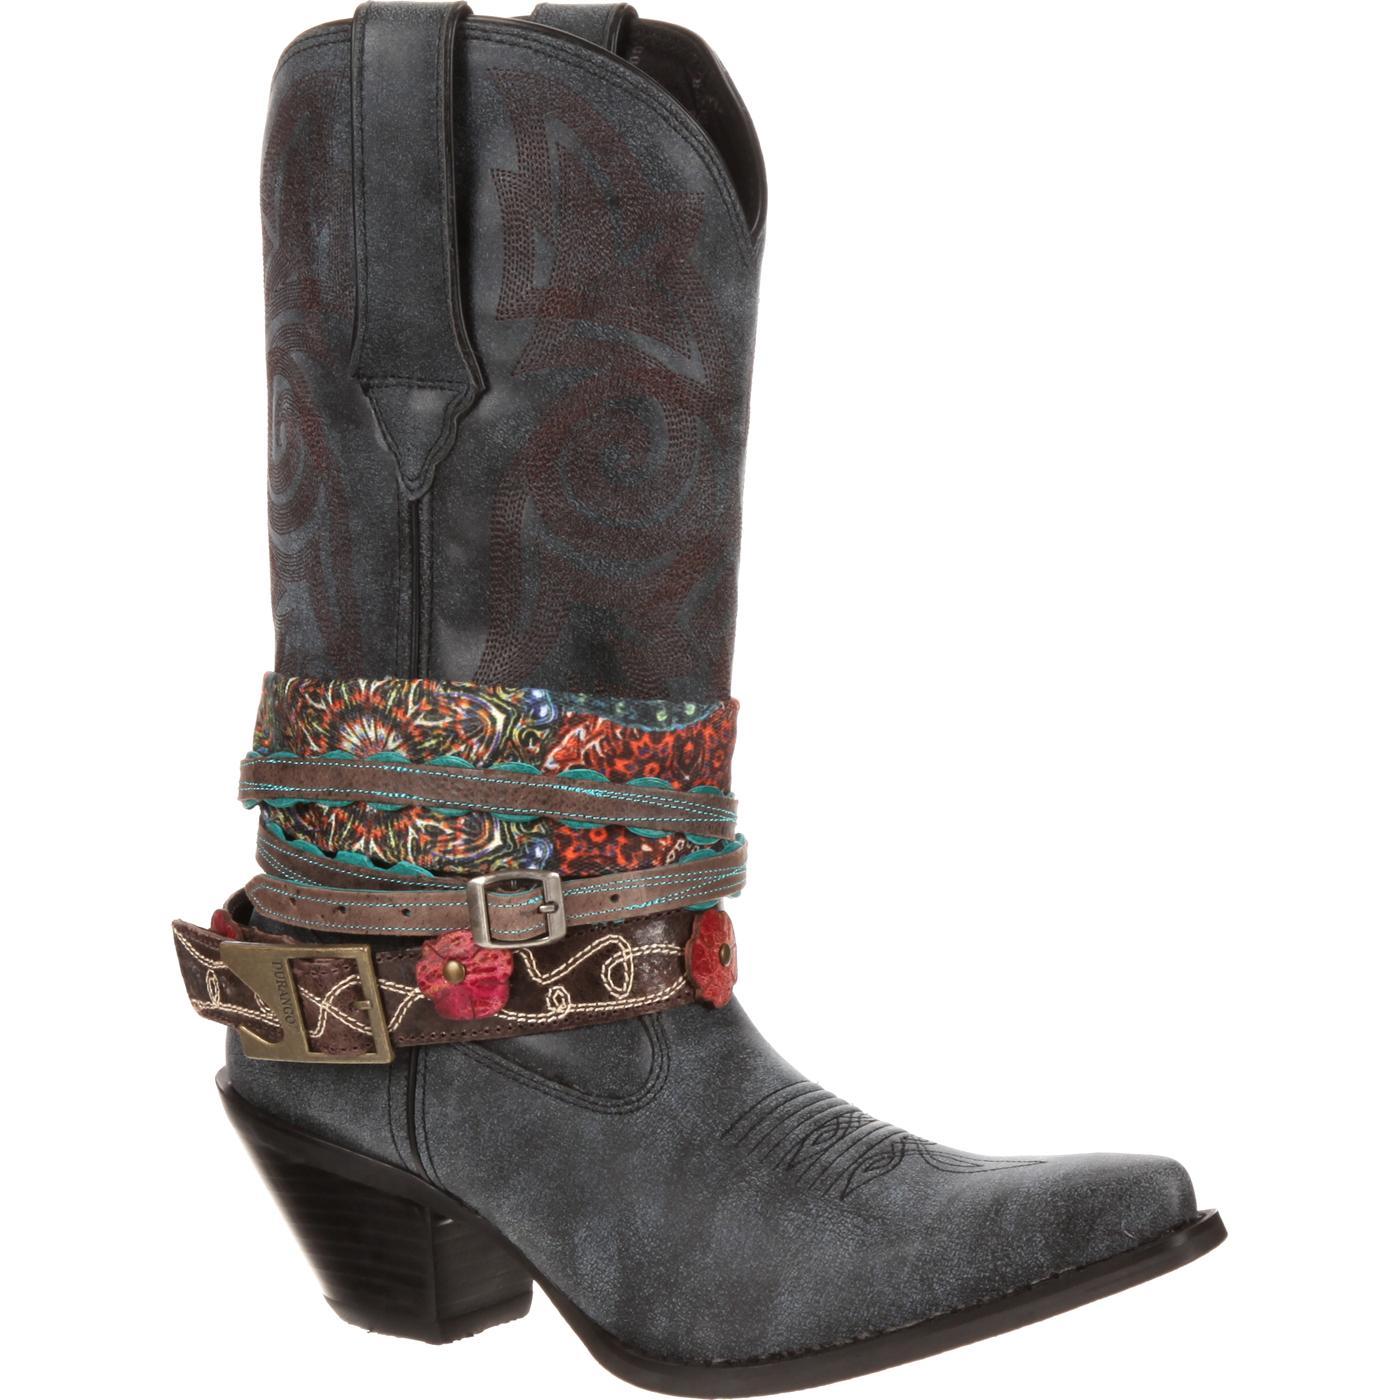 89454b2c136 Crush by Durango Women s Accessorize Western Boot